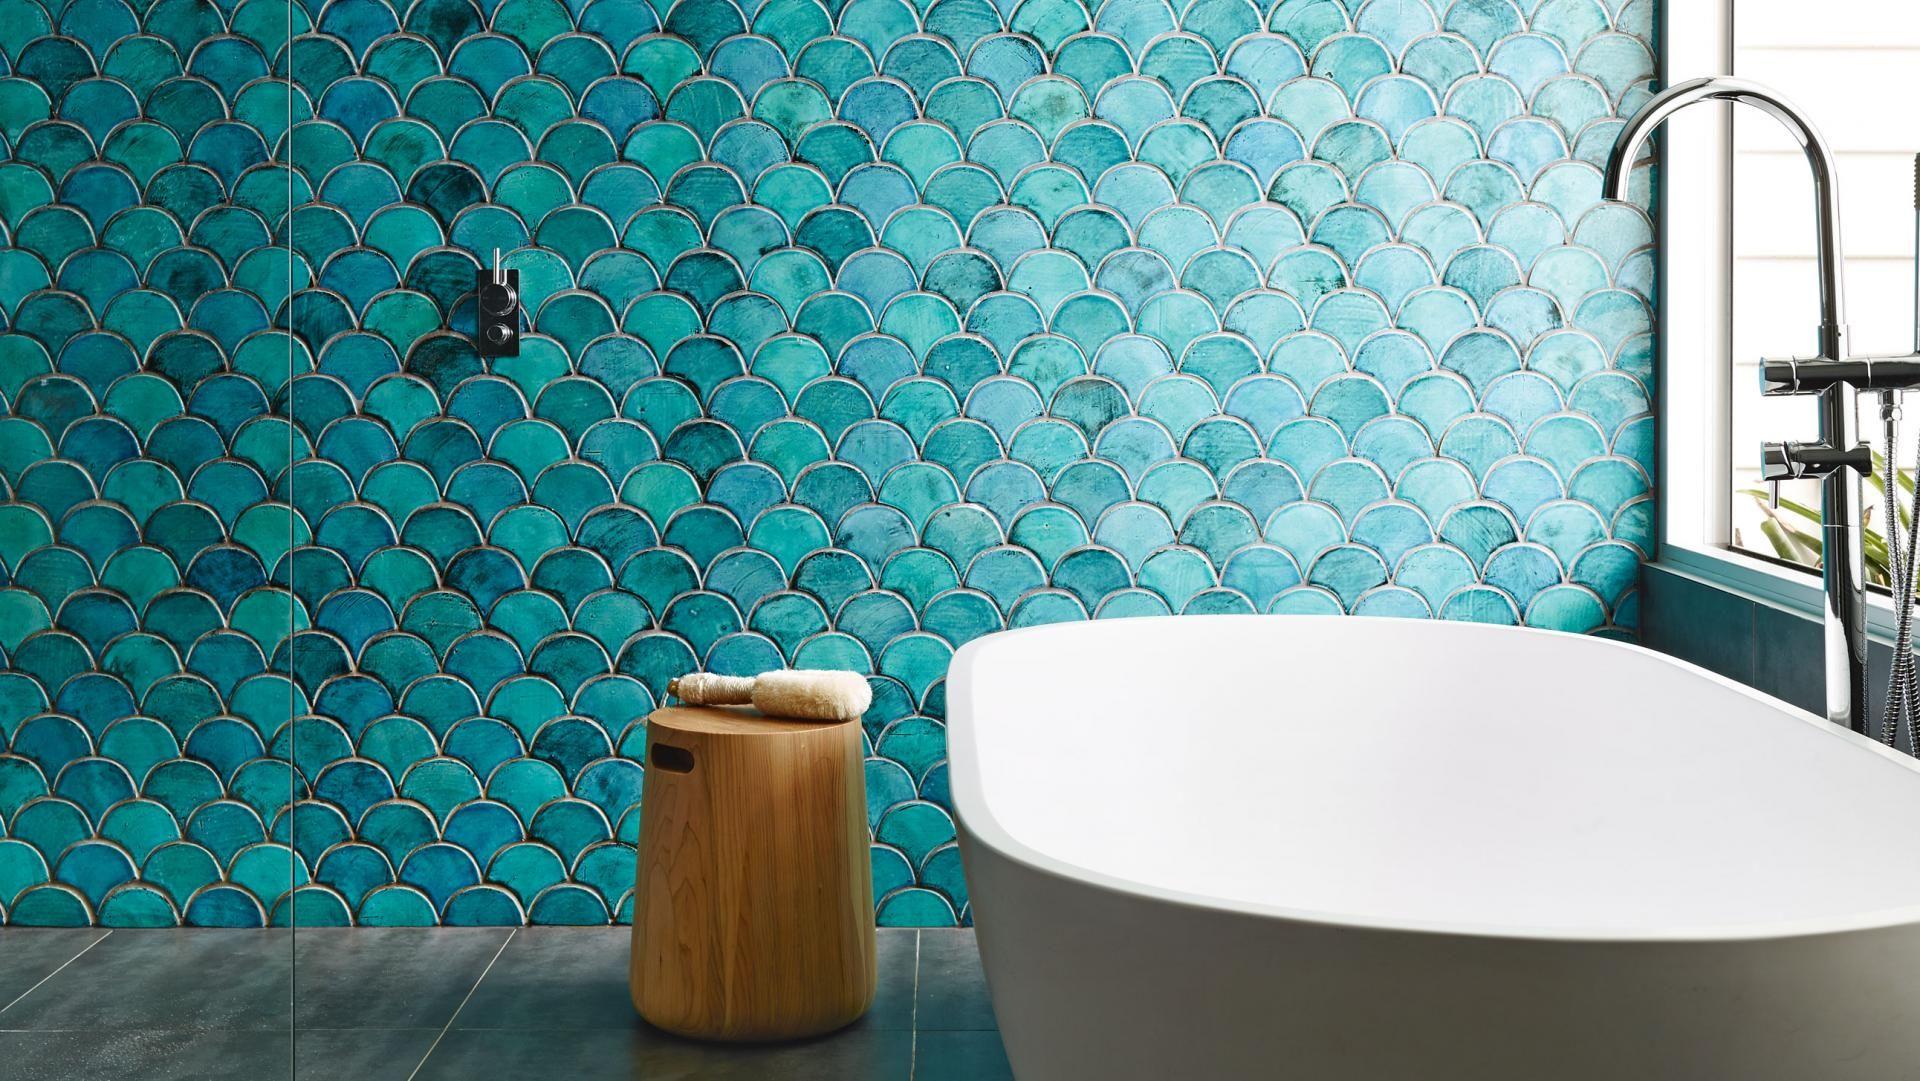 Bathroom blue green tiles bath tub timber stool Feb15 images by A ...